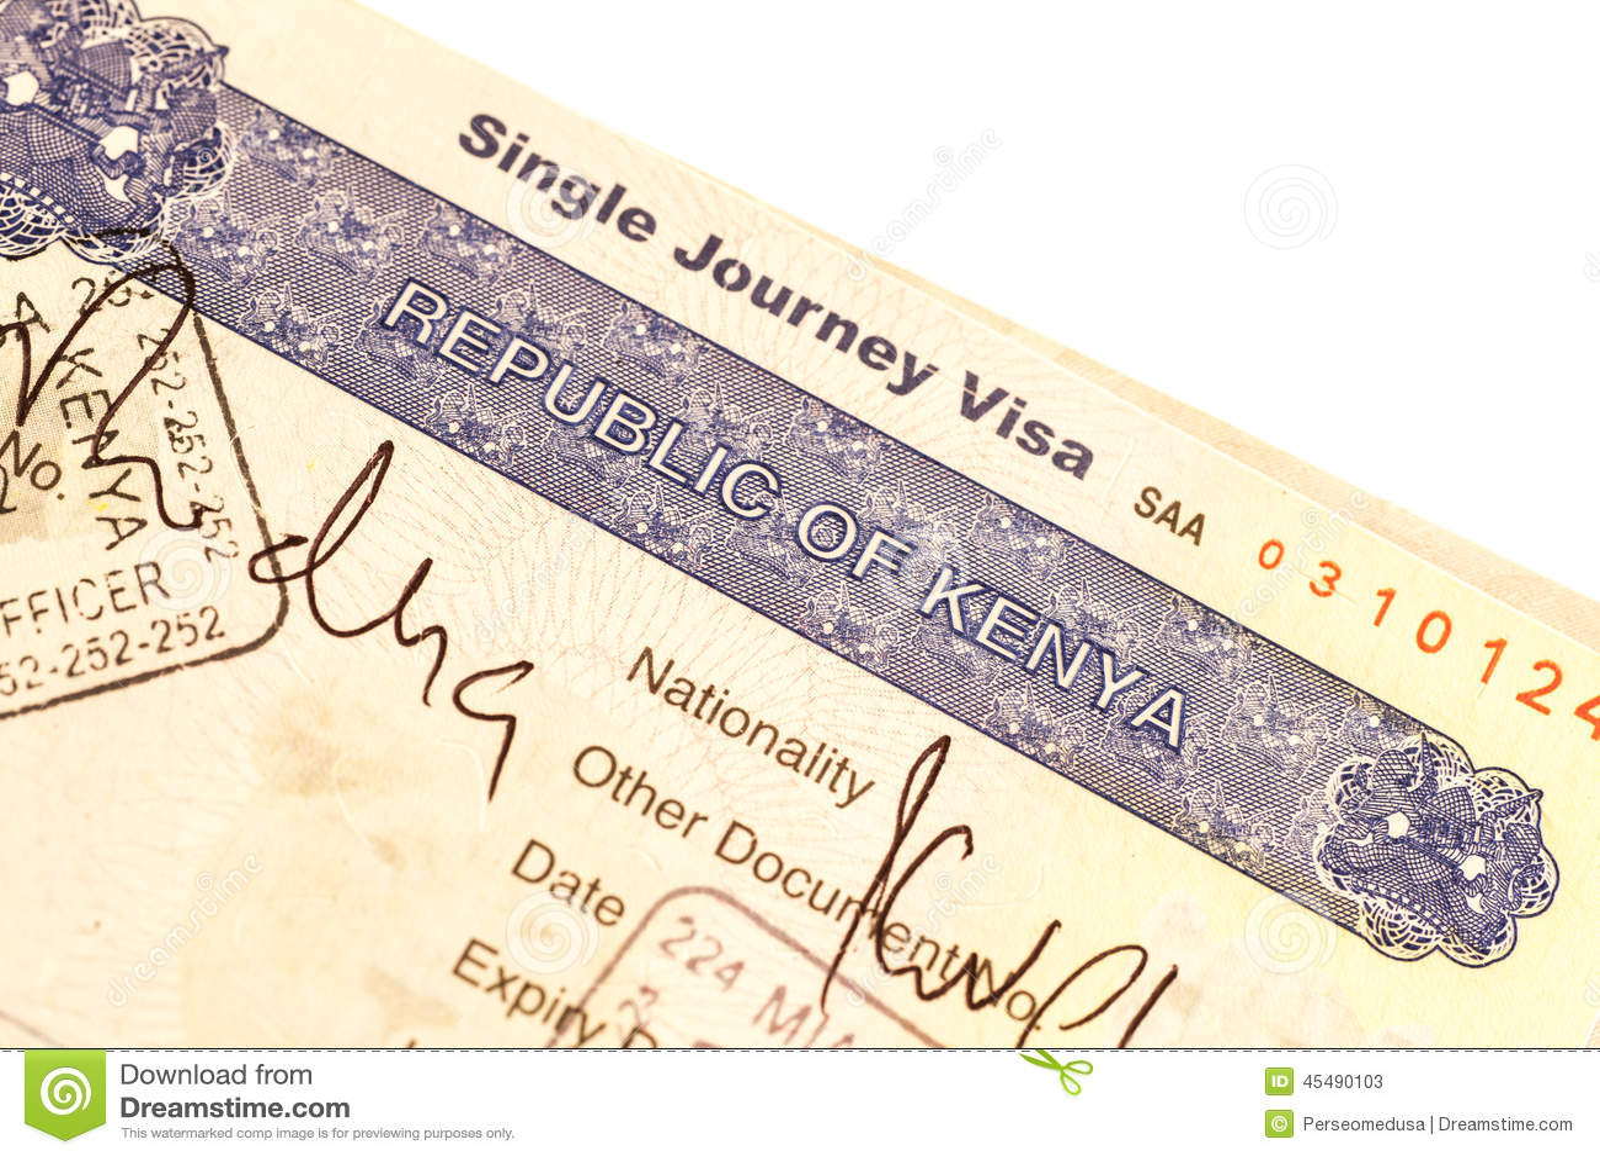 Kenya Visa Stock Photo